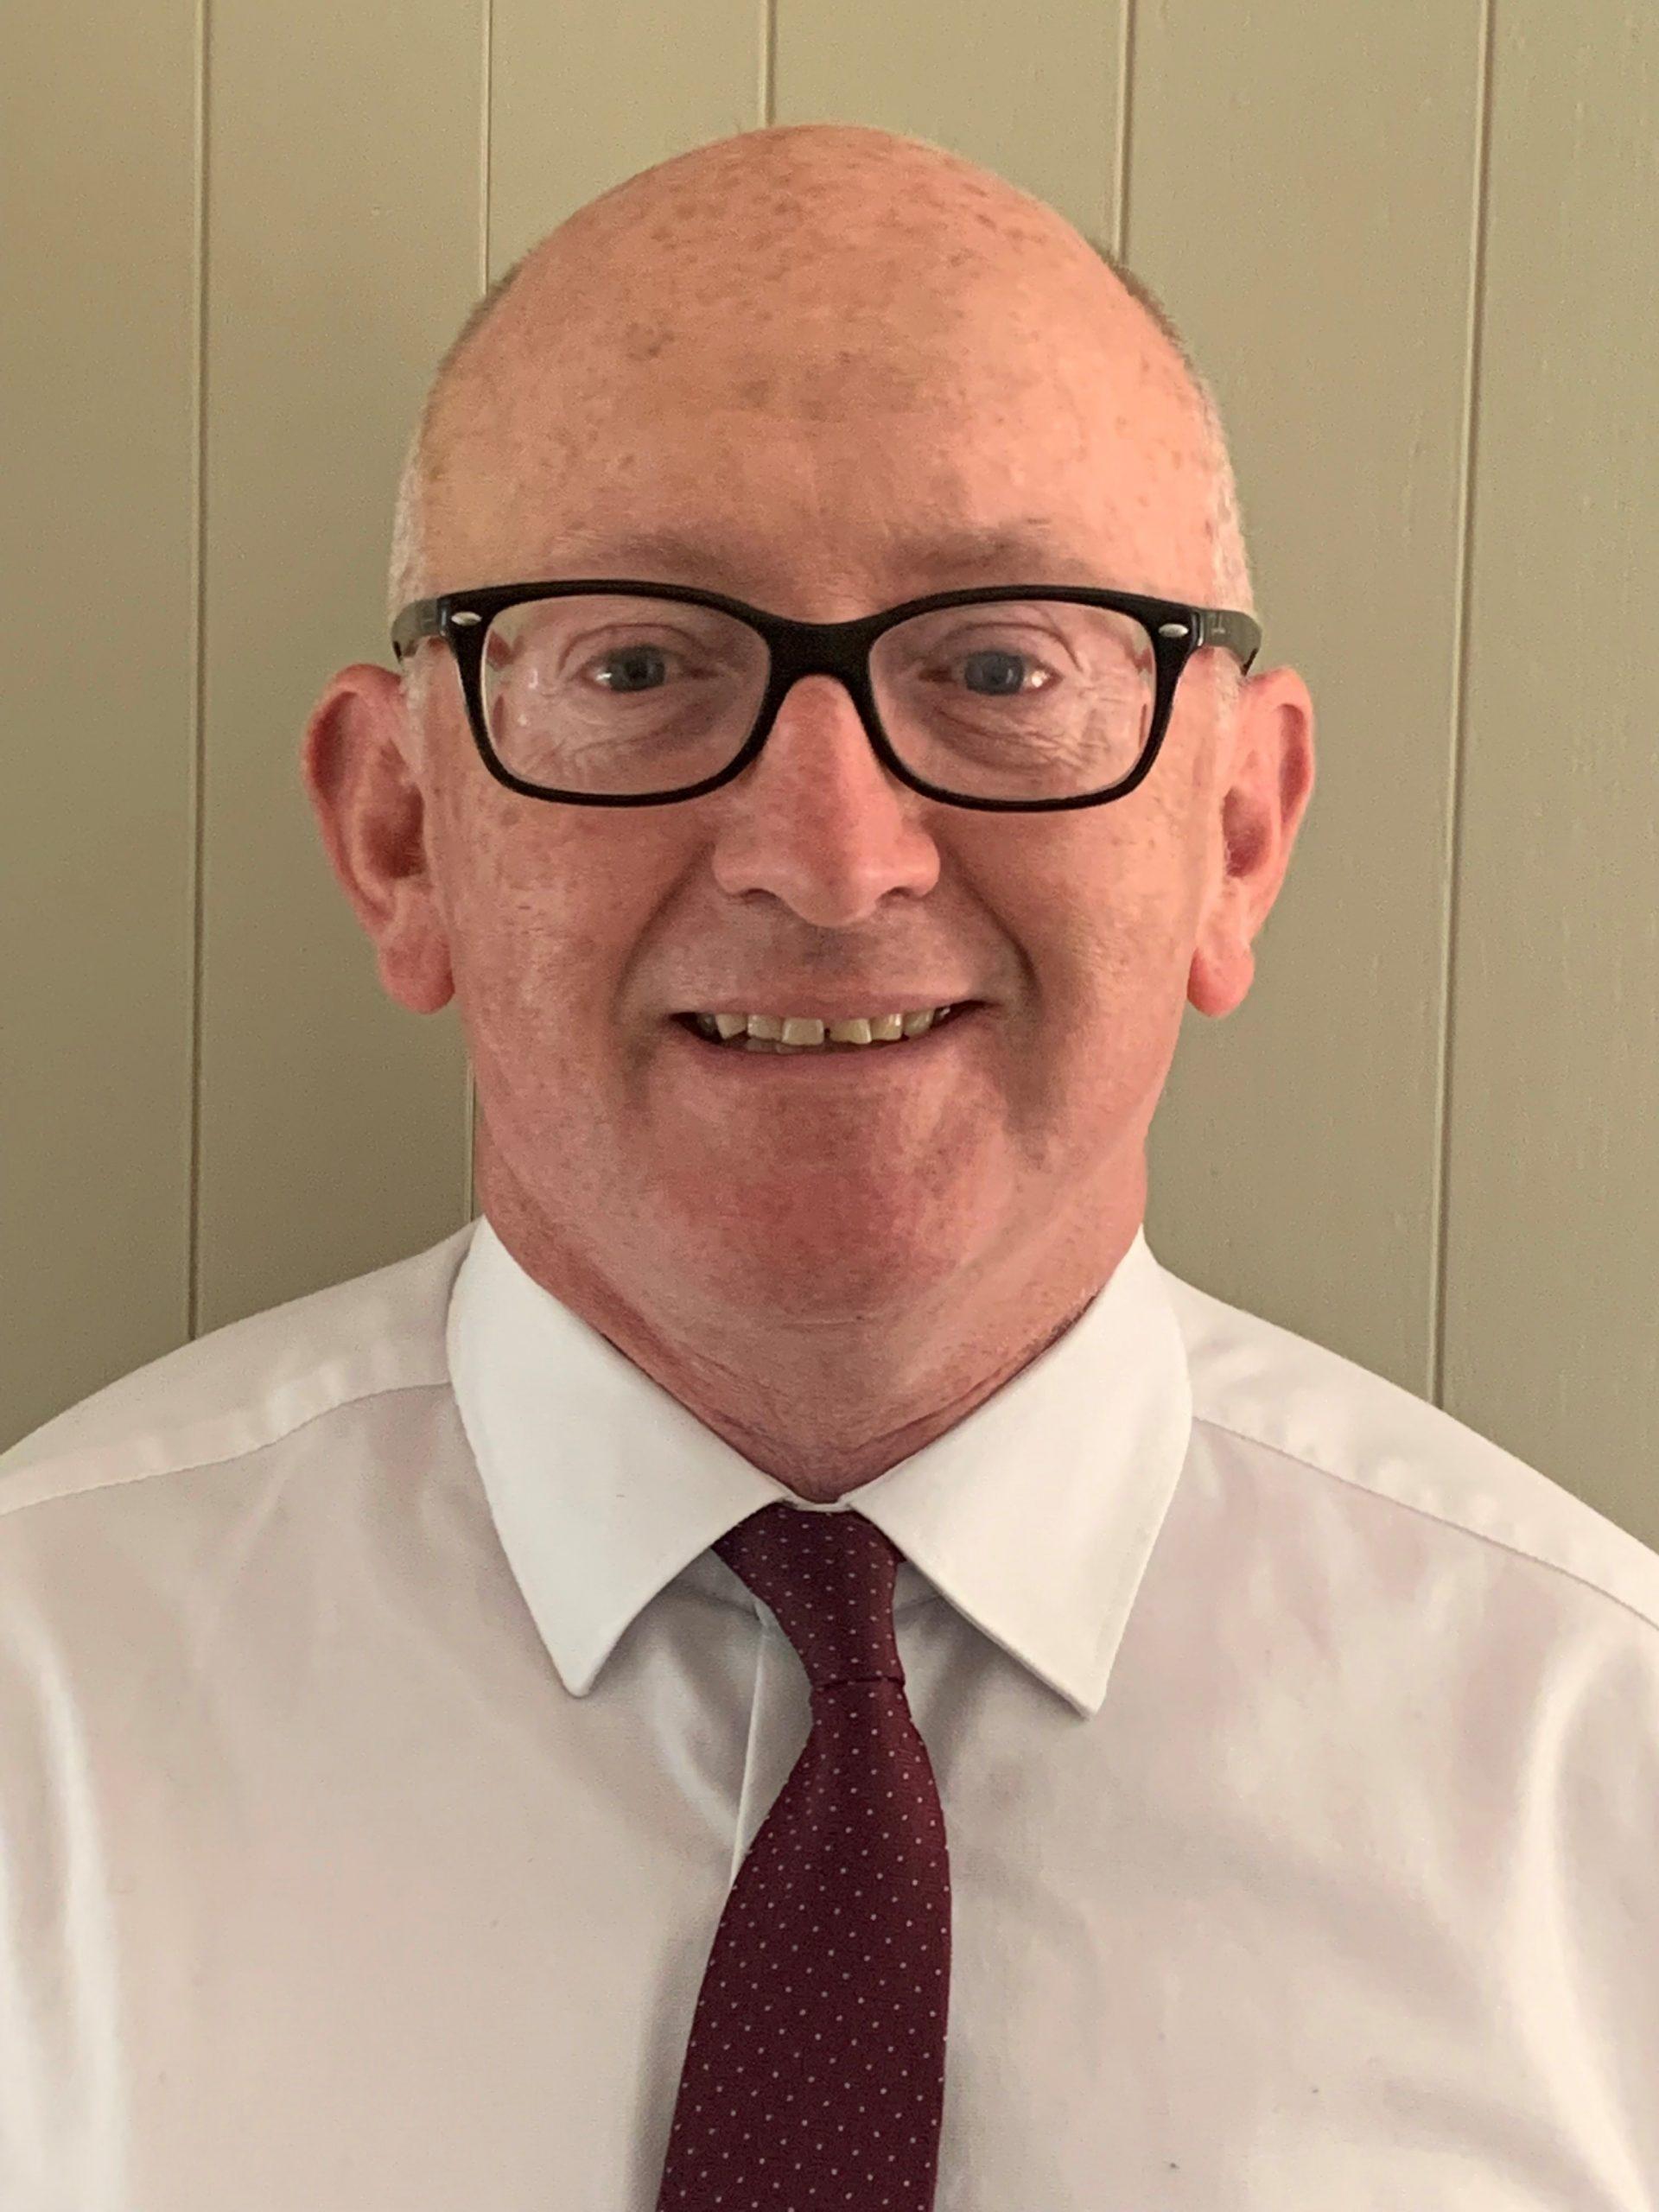 Tony McBride - Foscadh Housing